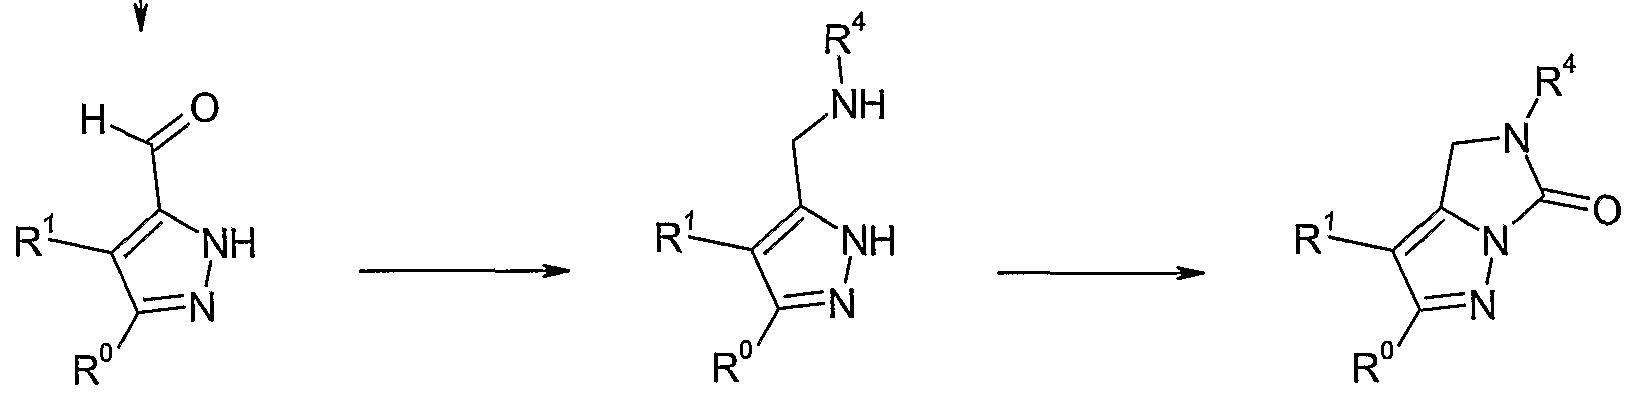 WO2005061506A1 - Bicyclic pyrazolyl and imidazolyl compounds